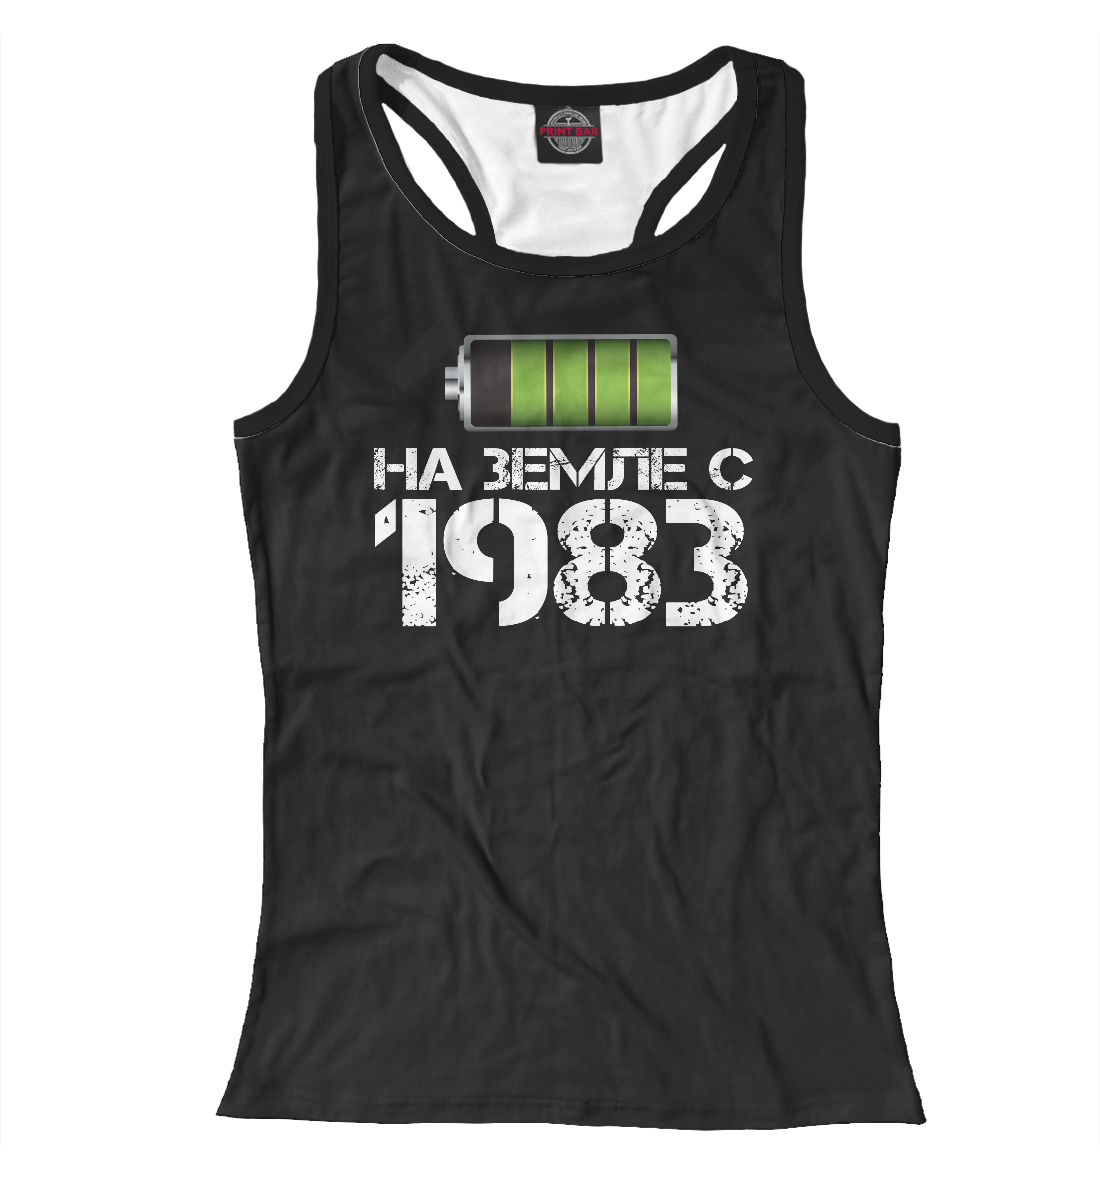 Купить На земле с 1983, Printbar, Майки борцовки, DVT-480805-mayb-1